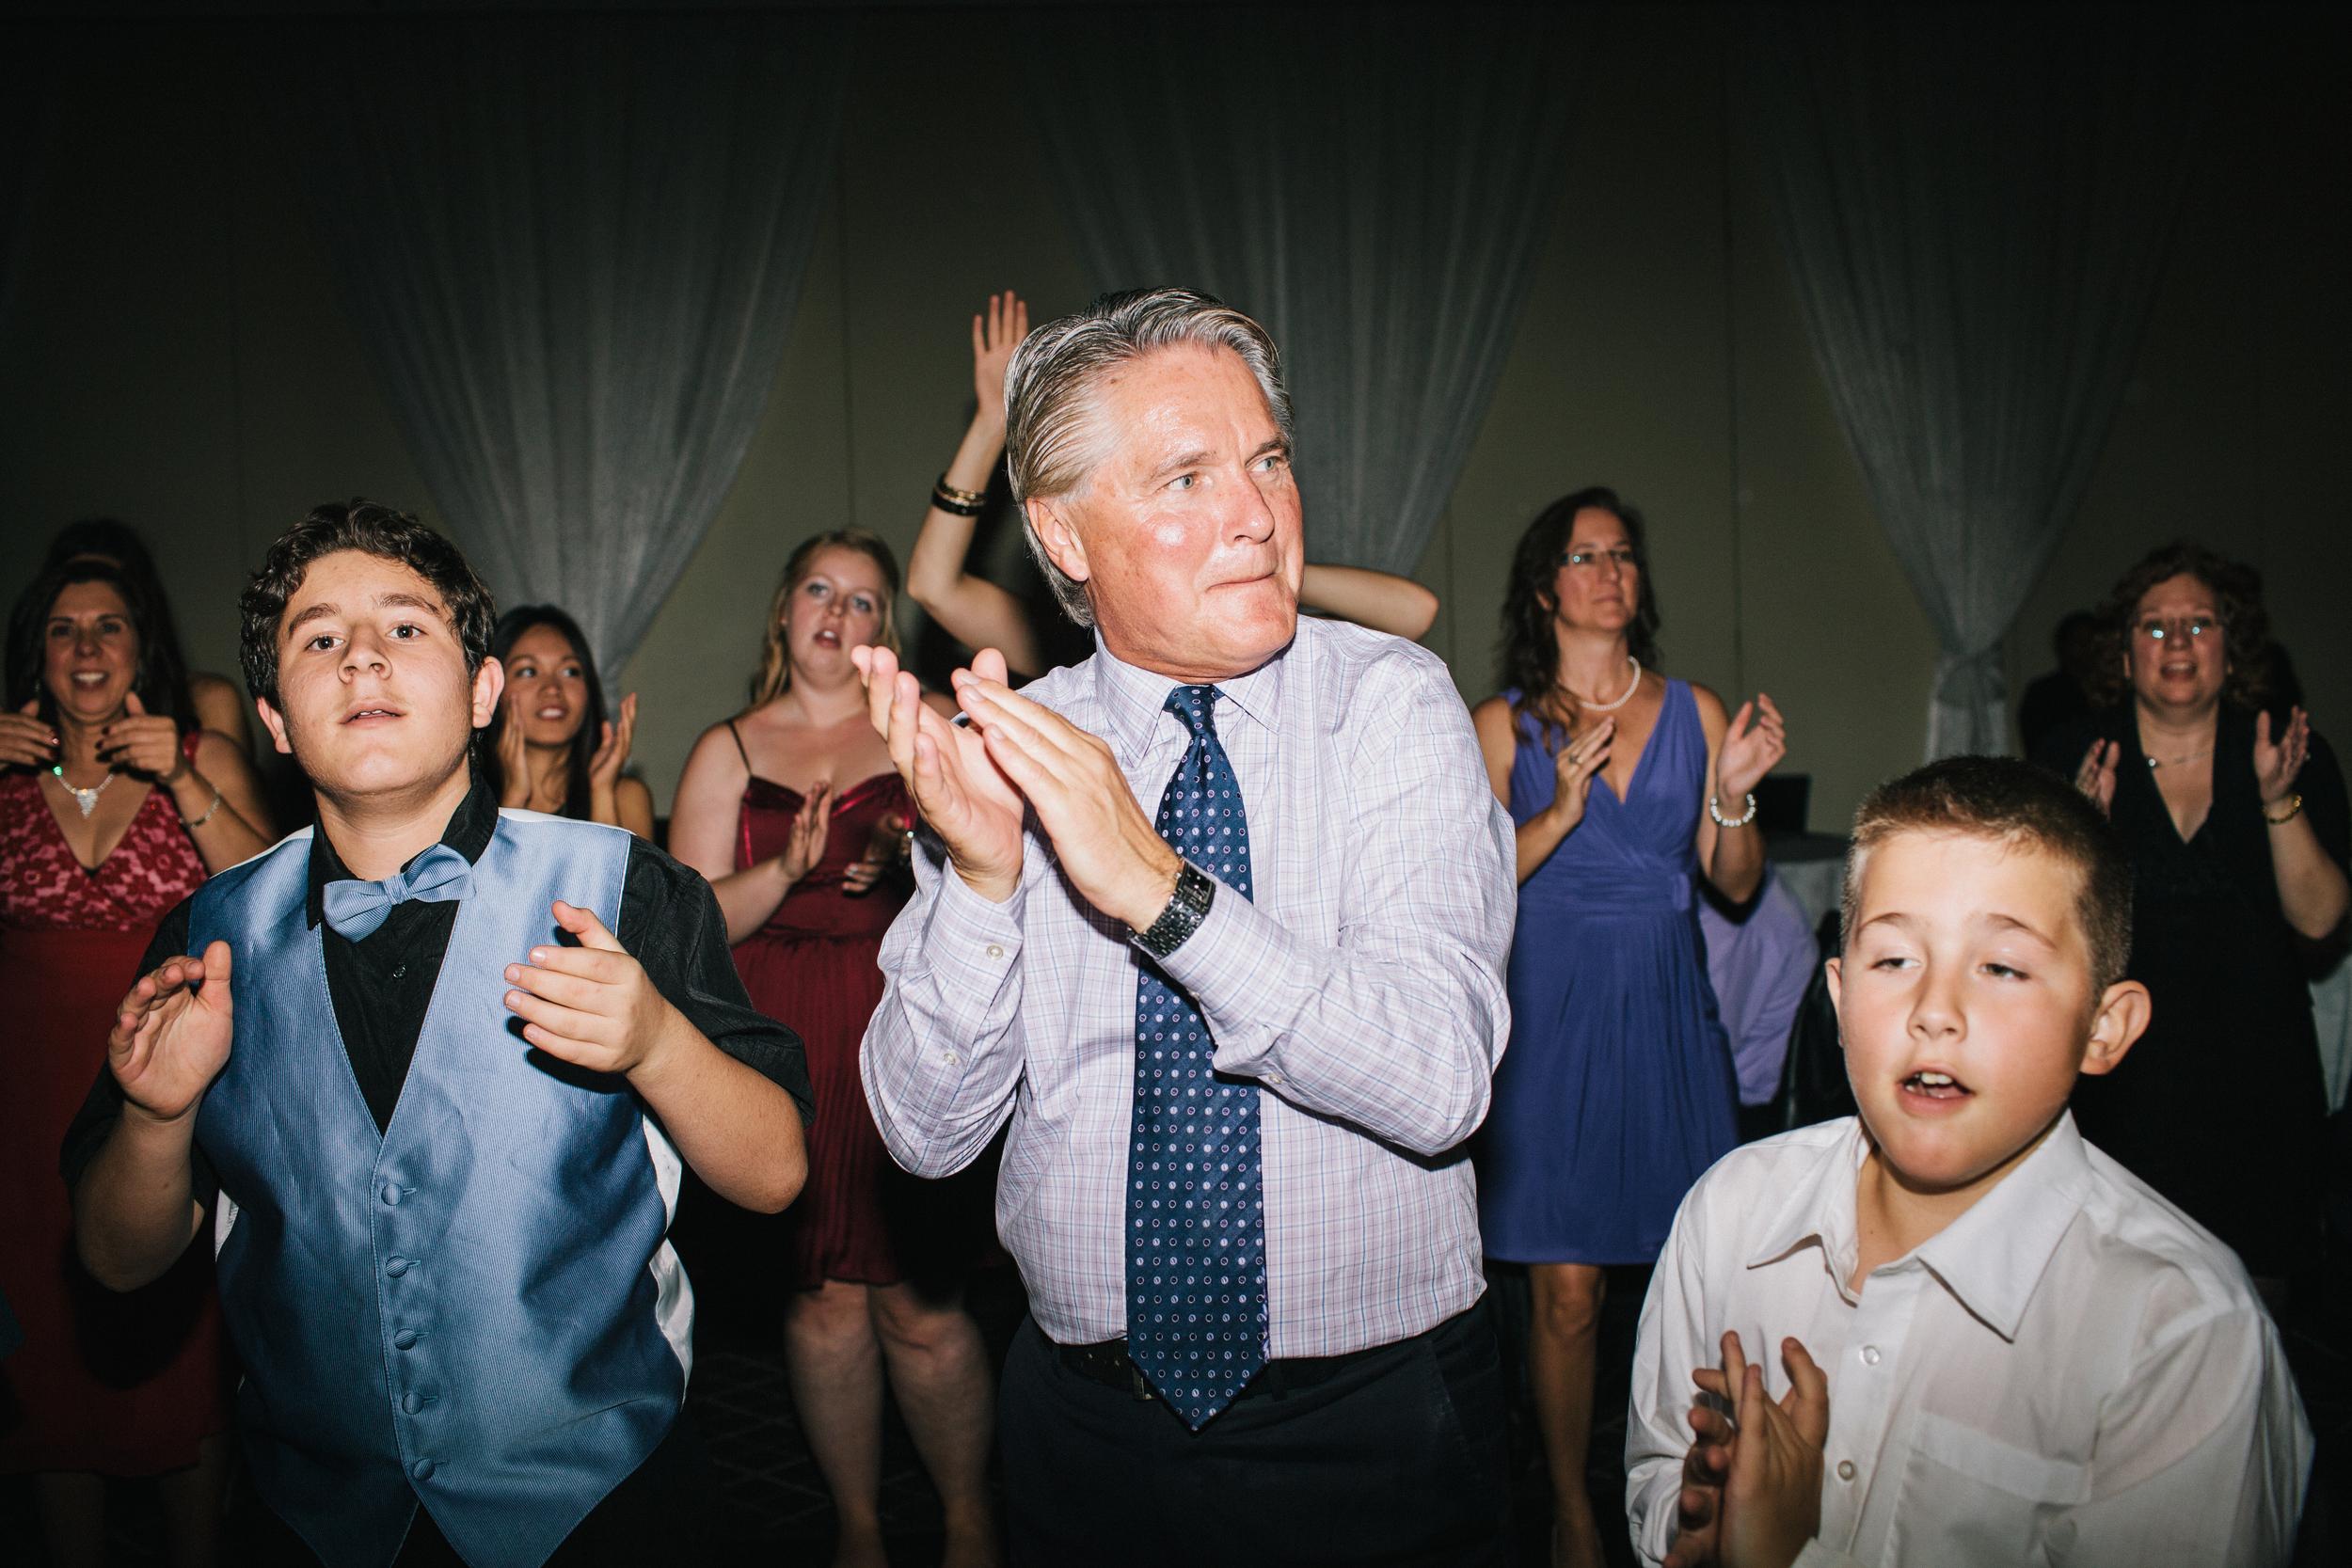 Stephanie-Kyle-paradise-banquet-hall-michael-rousseau-photography-best-toronto-wedding-photographer-documentary-wedding046.JPG